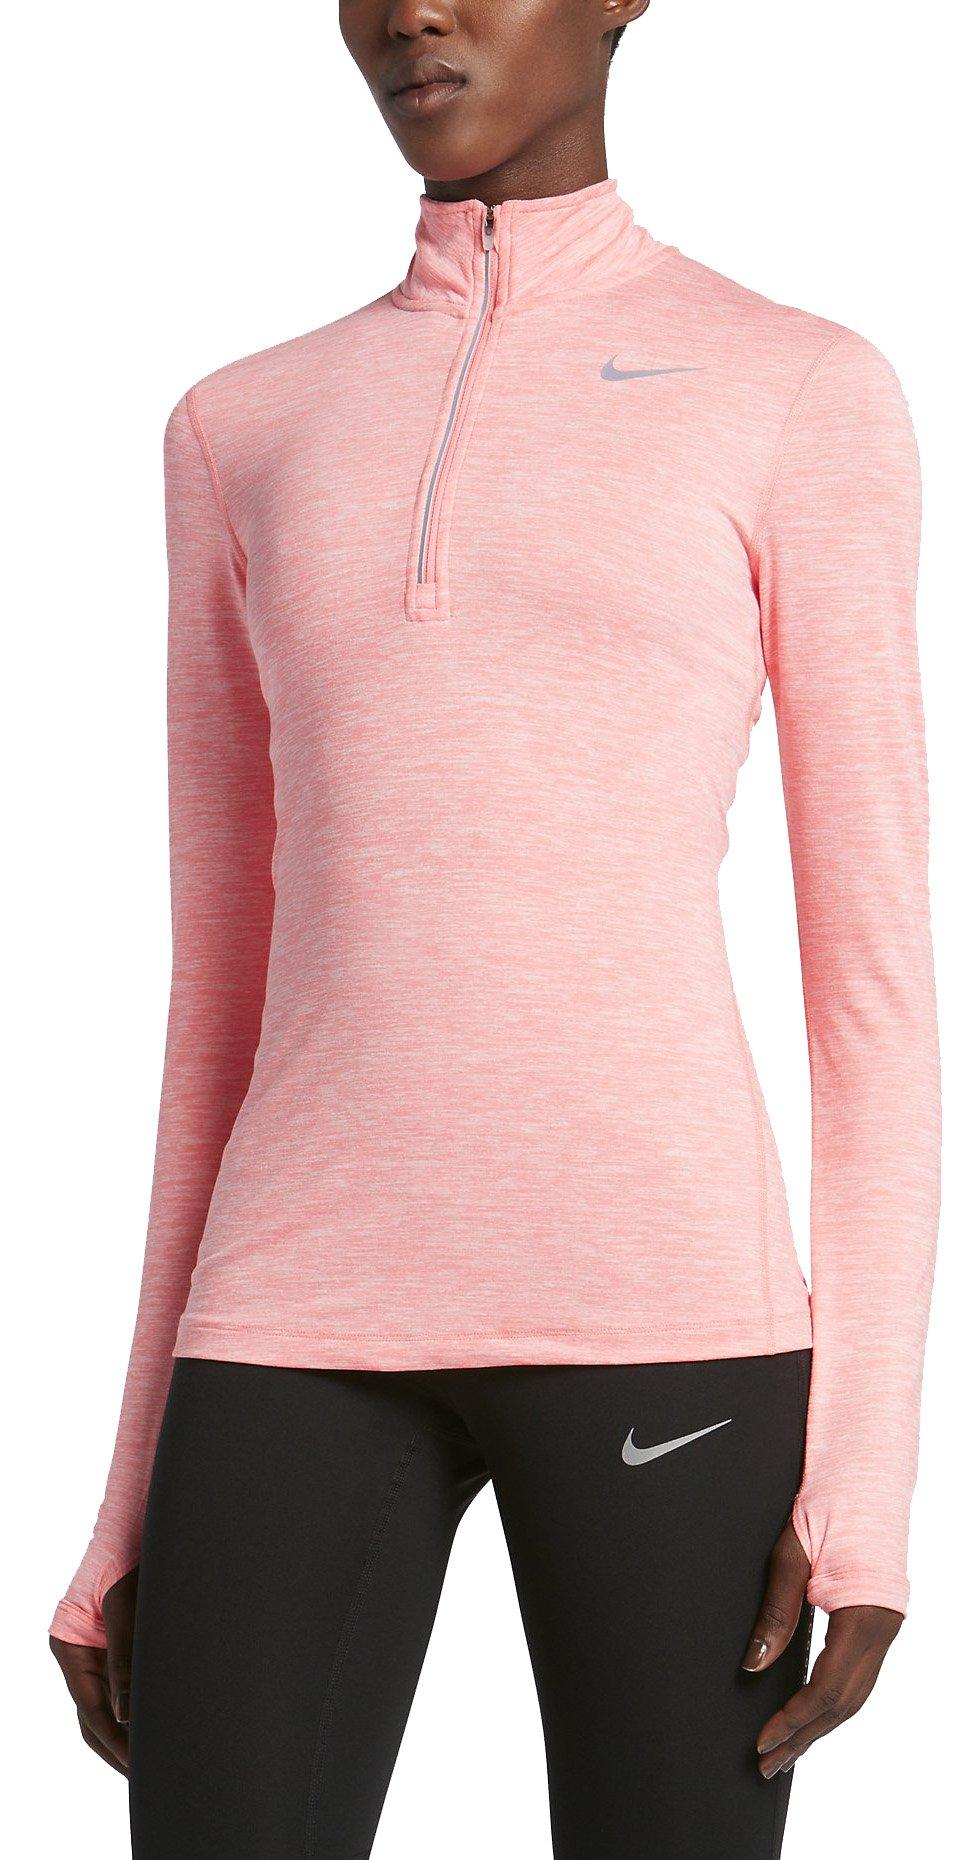 Běžecké tričko Nike Dri-FIT Element